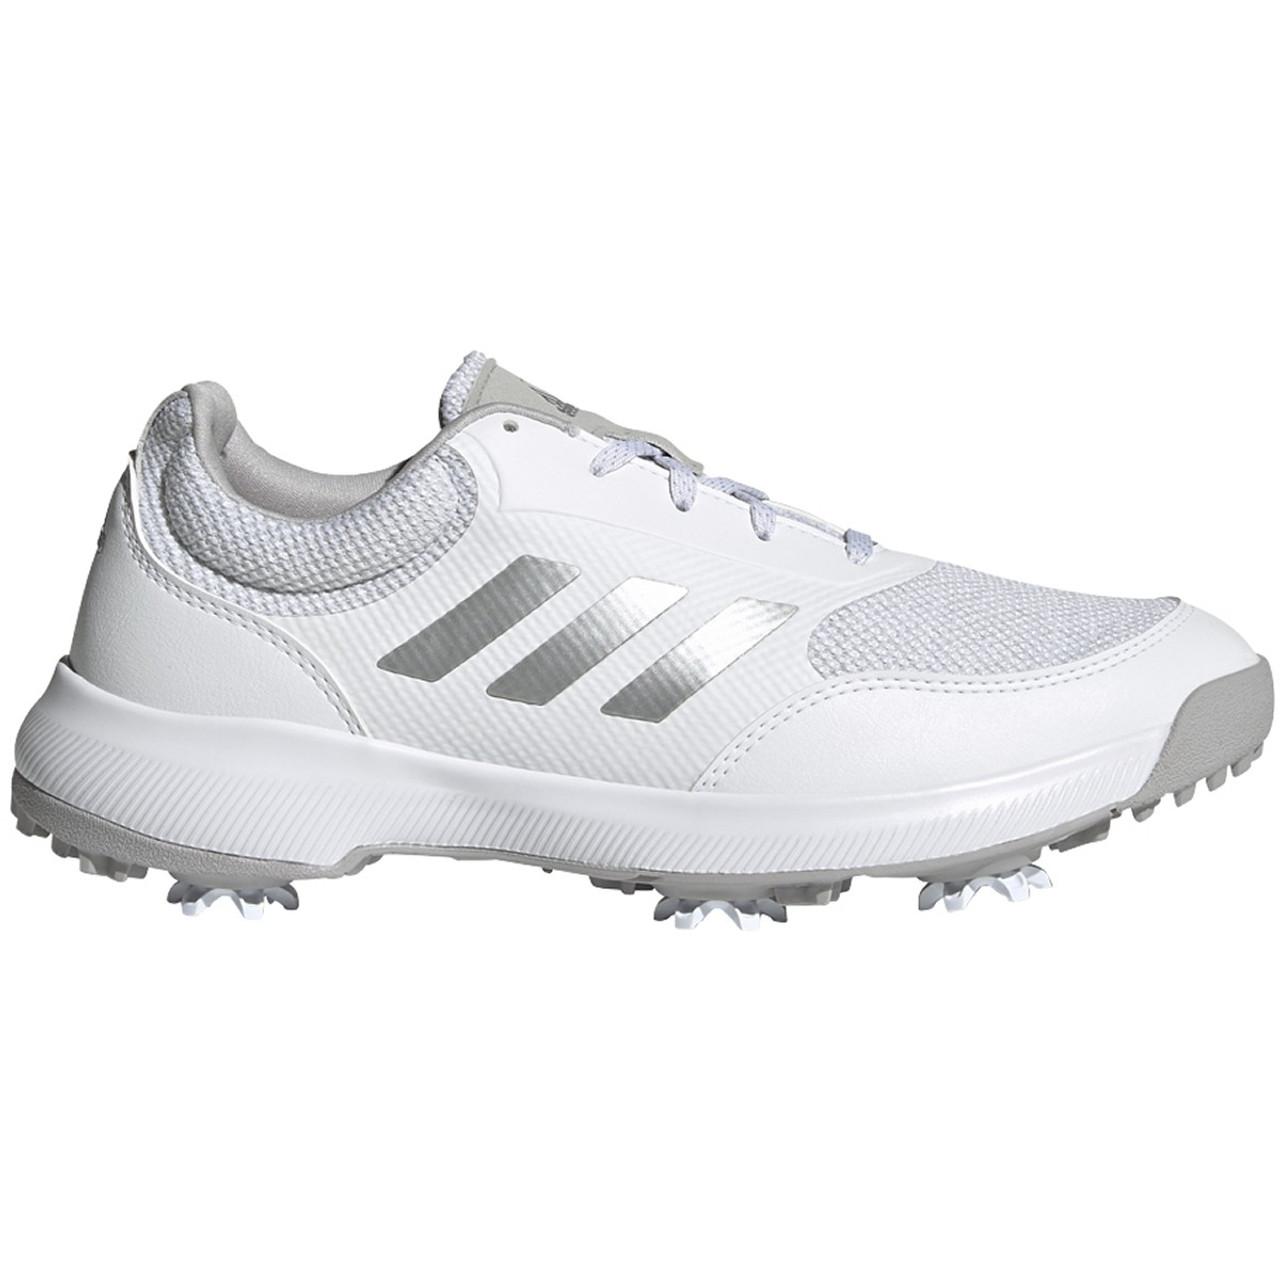 Adidas Womens Tech Response Golf Shoes- White / Silver / Grey Two